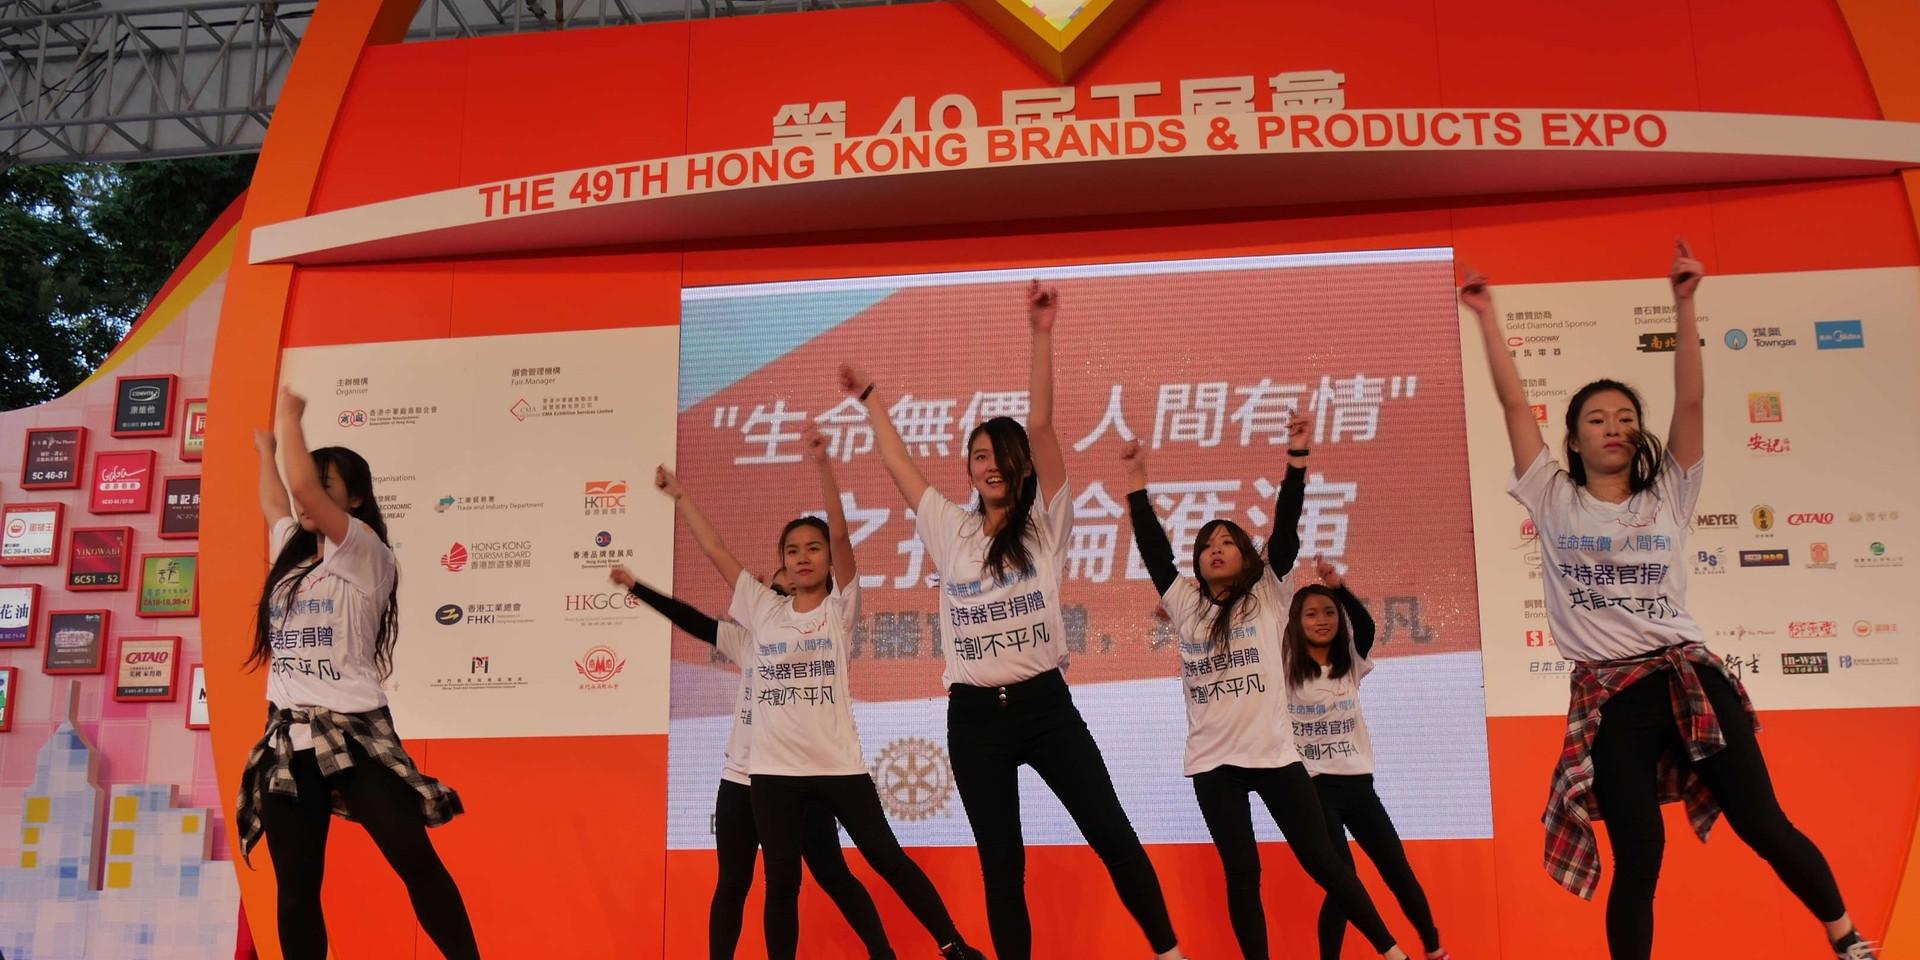 organ donataion campaign-26.jpg.iyz58ev.